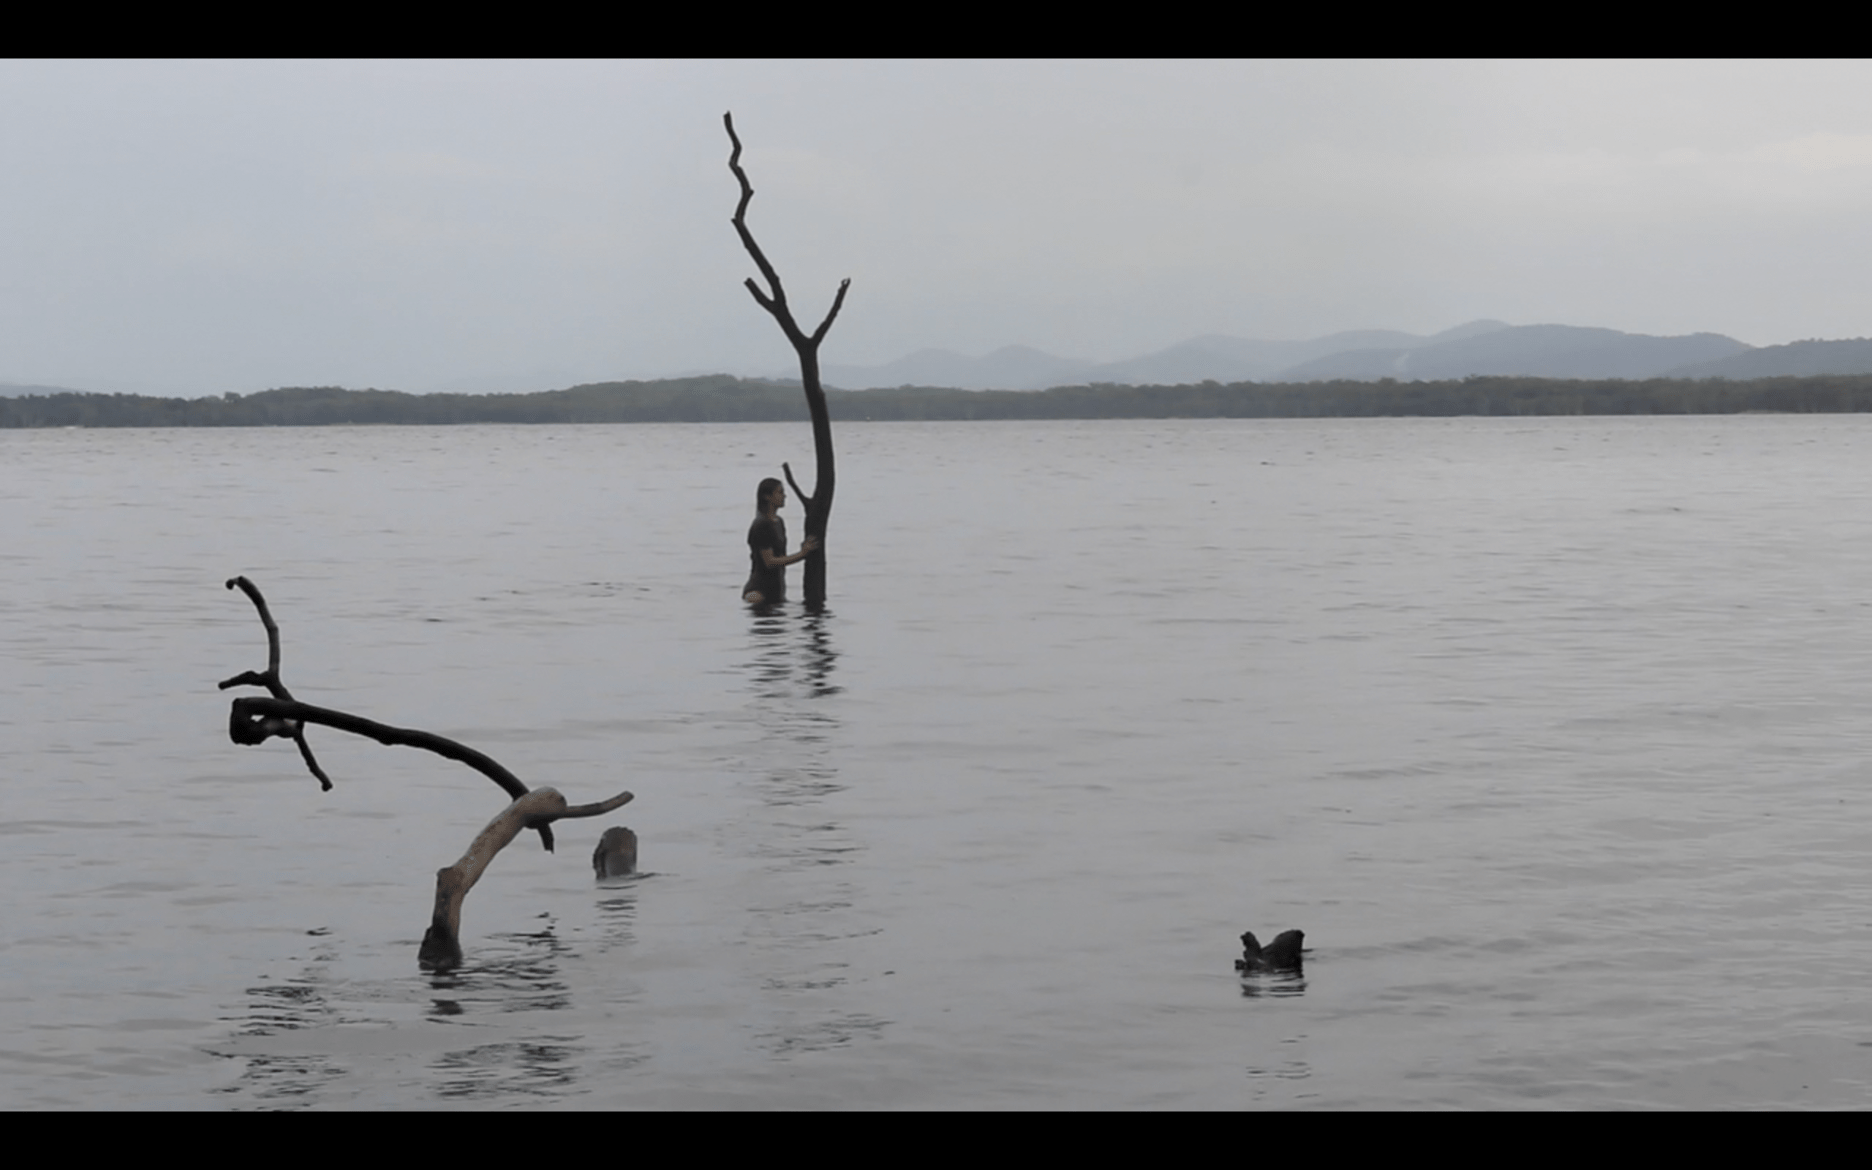 Lottie Consalvo, 'The Last Arborist' (video still), 2020, single channel video, 02:49 mins, edition of 5 +1 AP